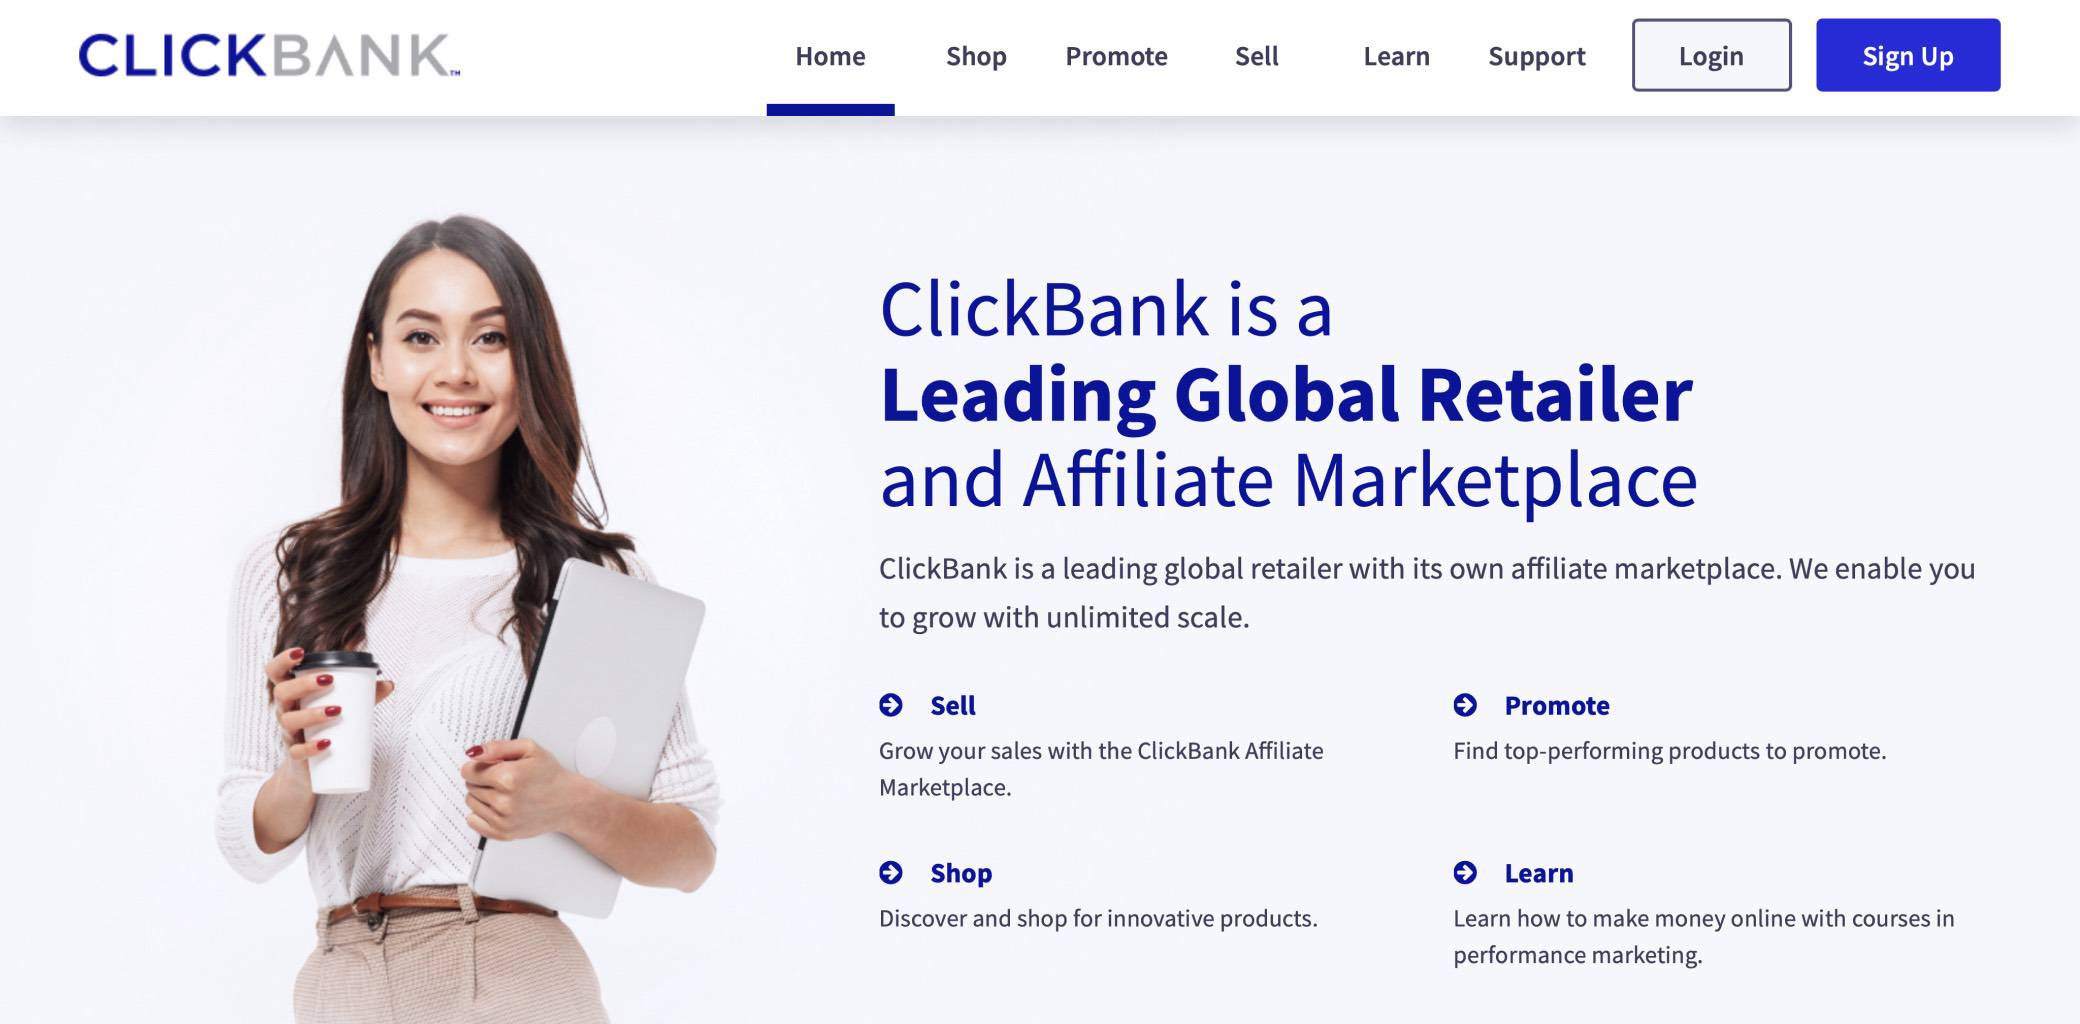 clickbank image